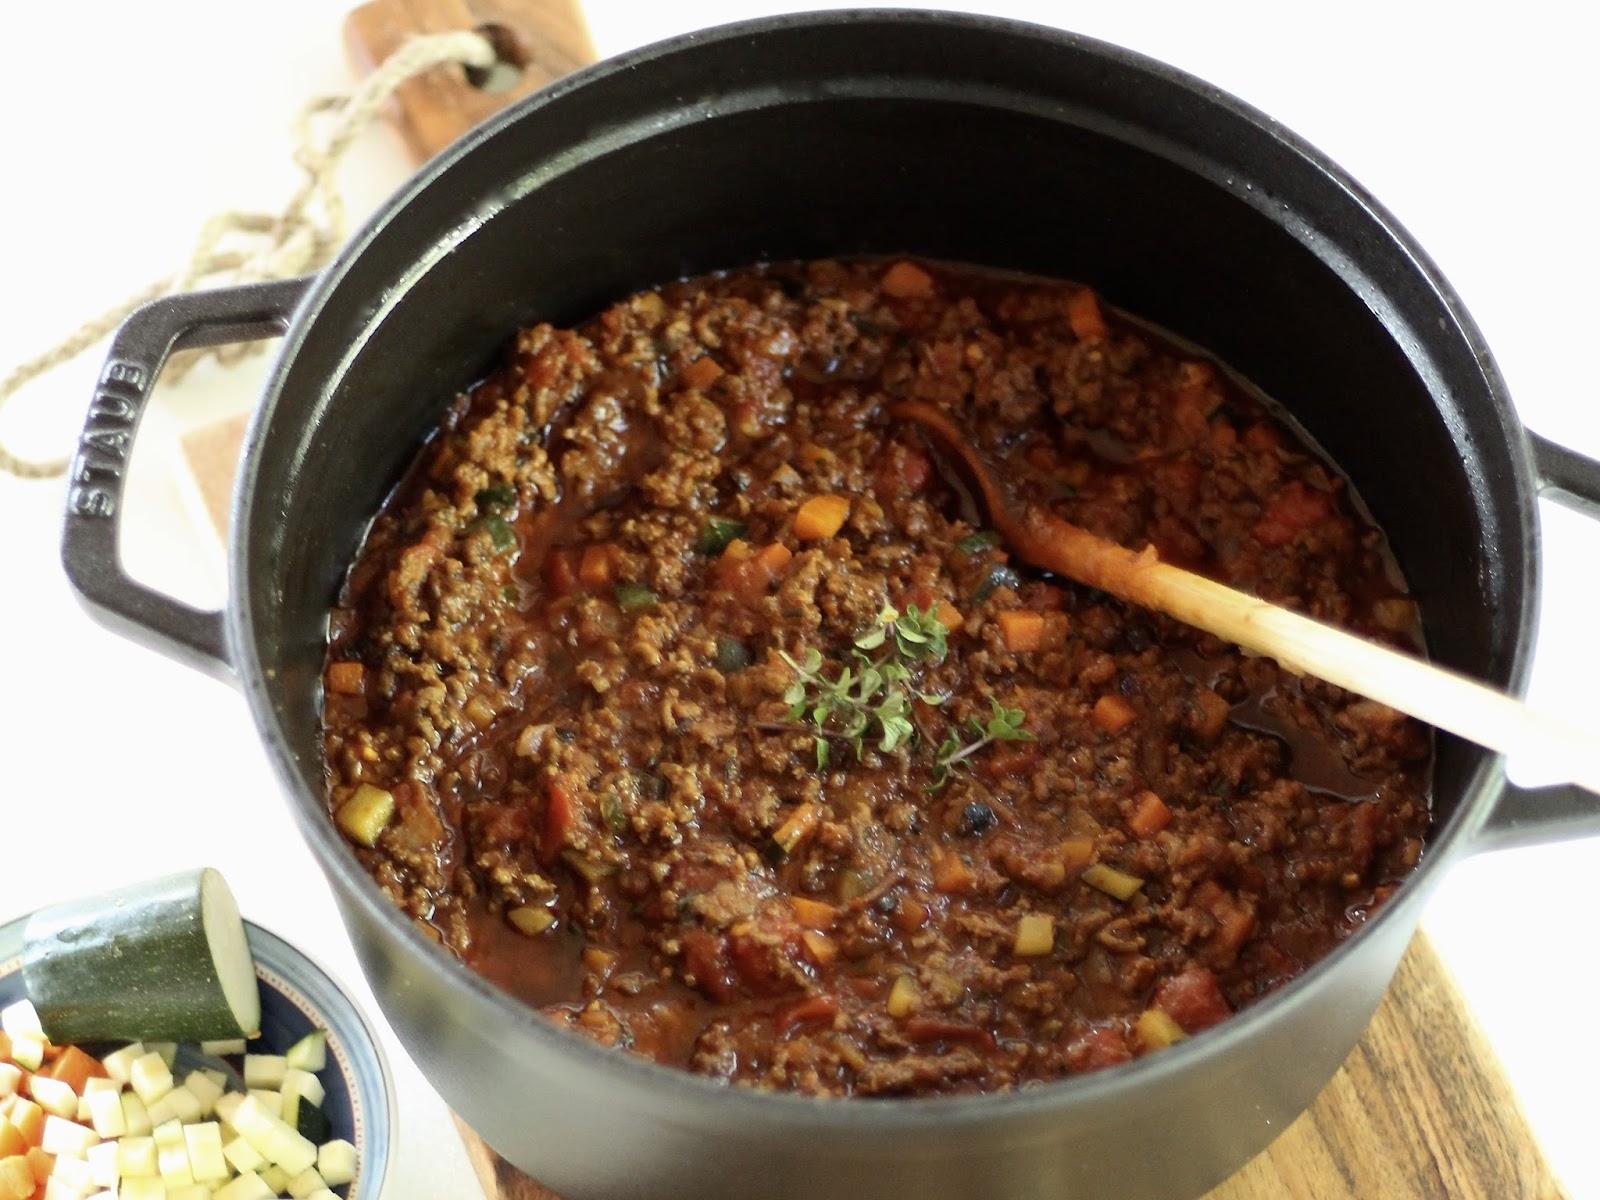 Rezept für leckere Spaghetti Bolognese à la Yushka